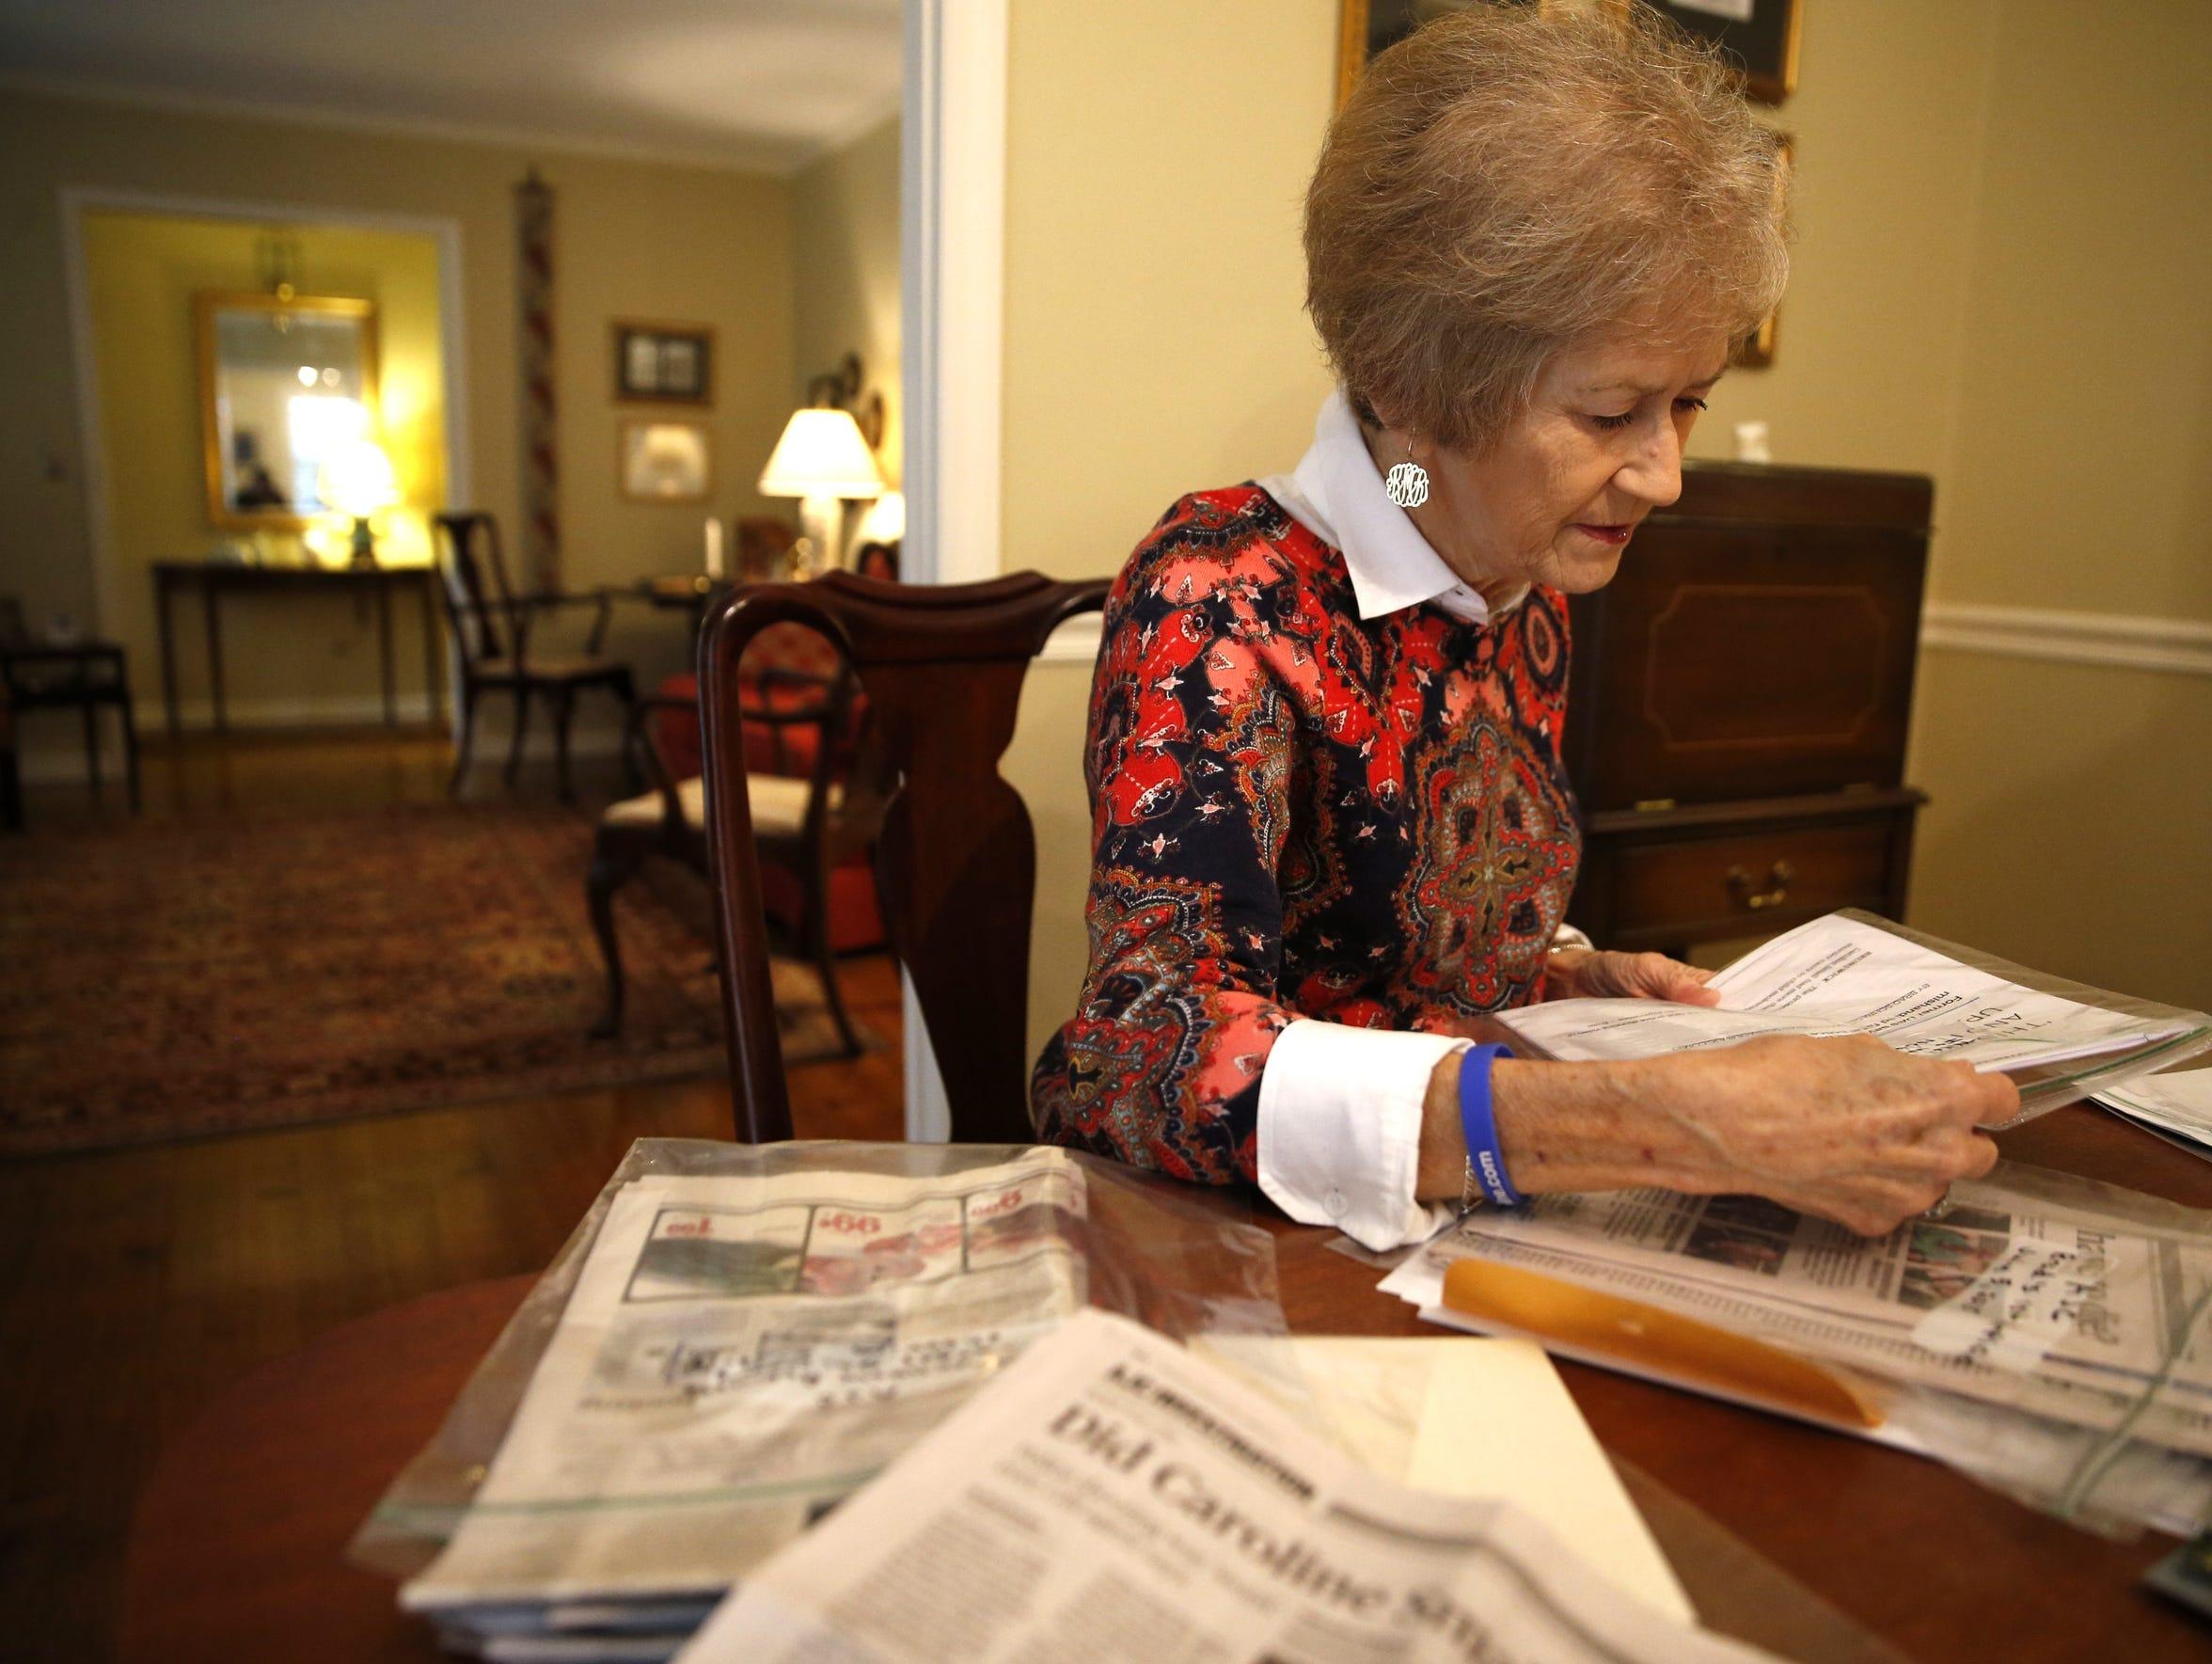 Karen McGehee looks over newspaper clippings, legal